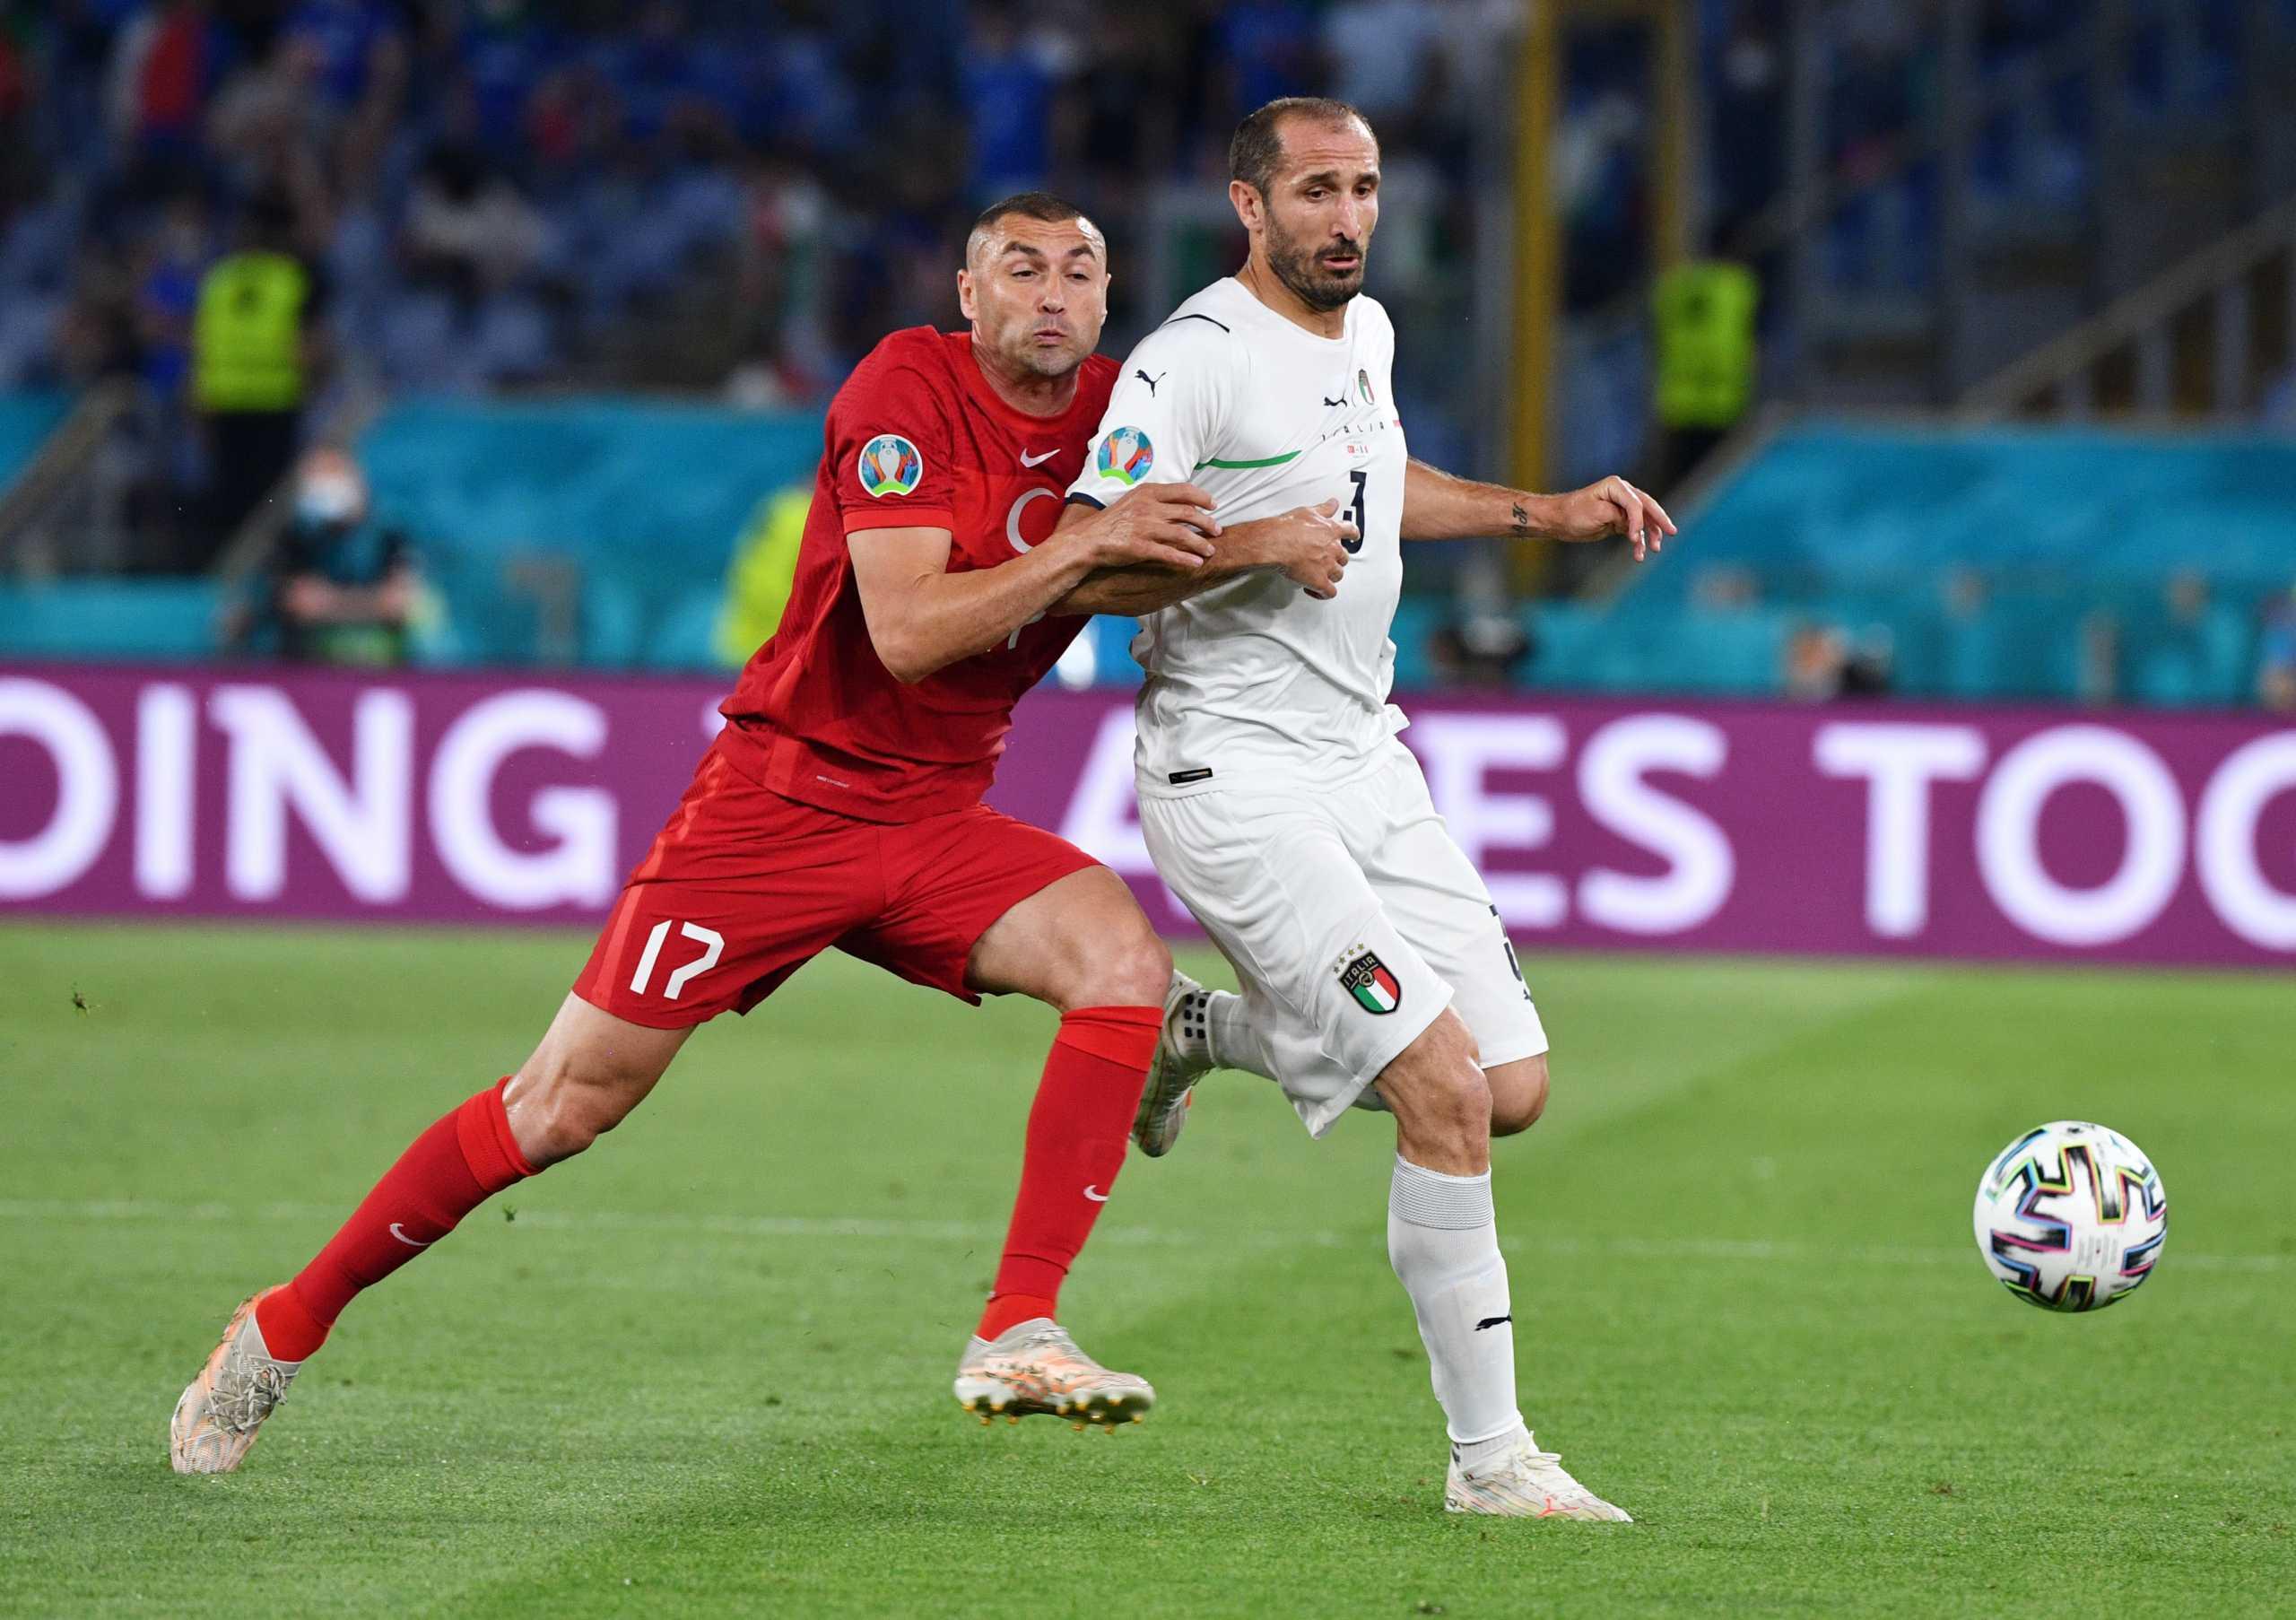 Euro 2020: Η 1η αγωνιστική συνεχίζεται με ματσάρες σε 1ο και 2ο όμιλο